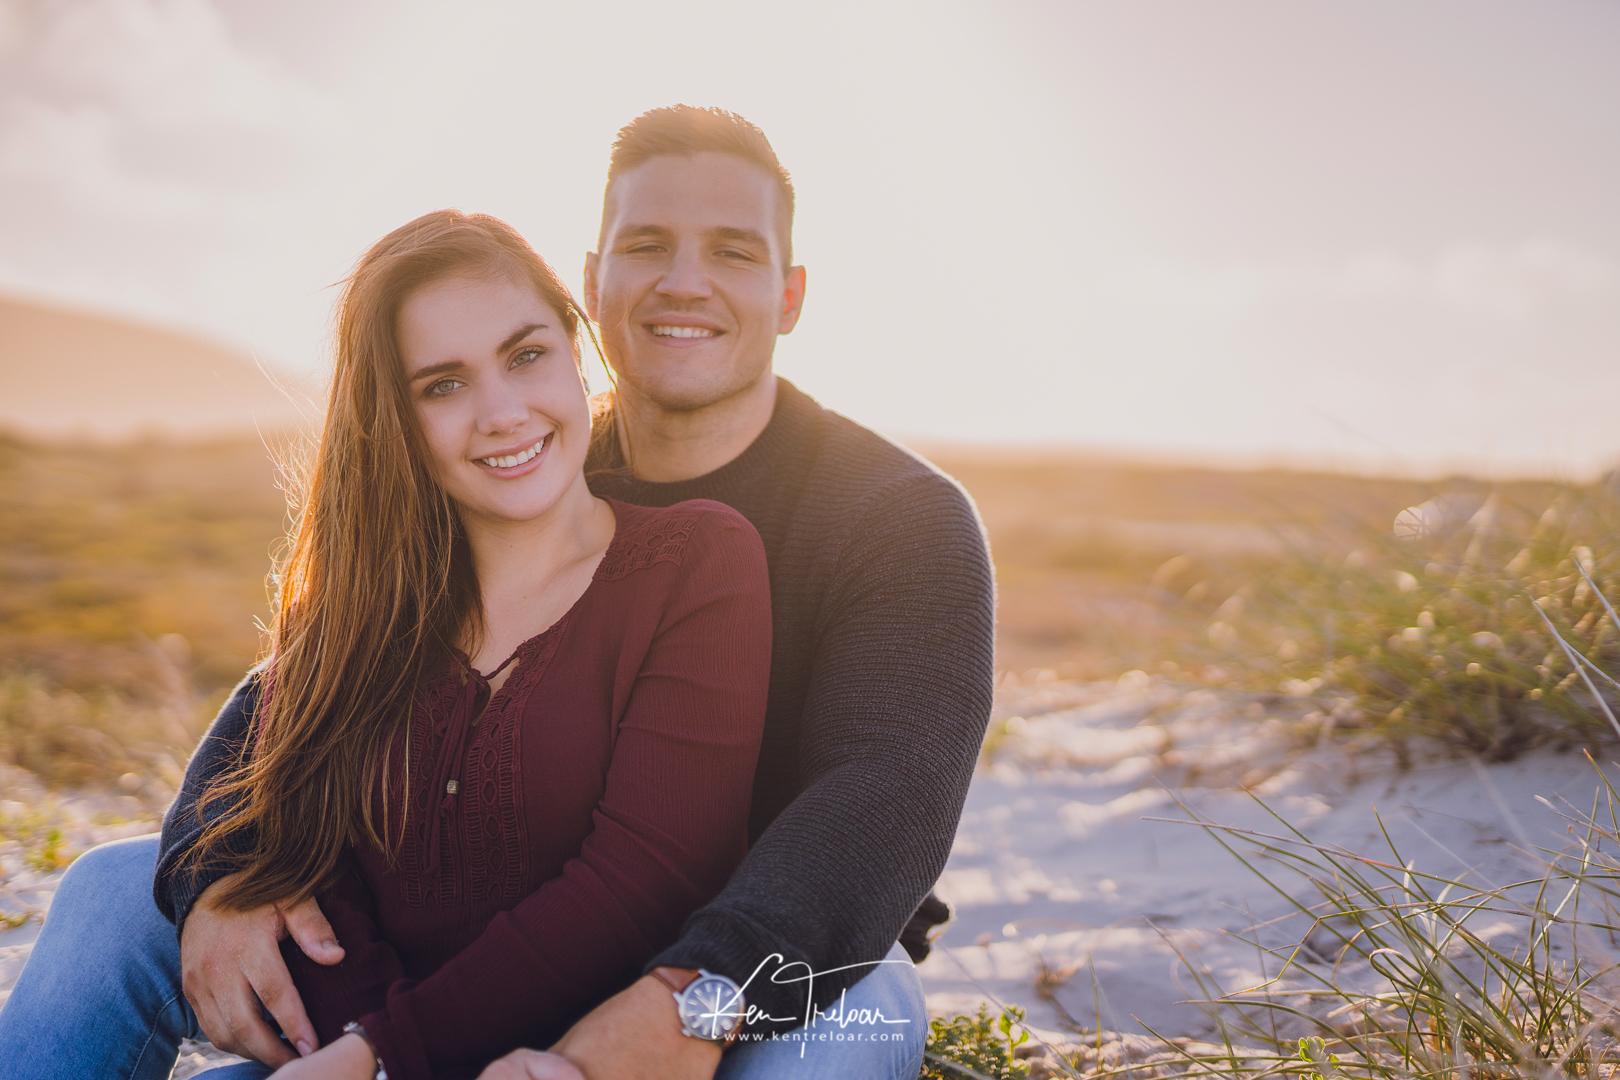 Ken Treloar - Romantic Couples photoshoot Cape Town 2019-6.jpg